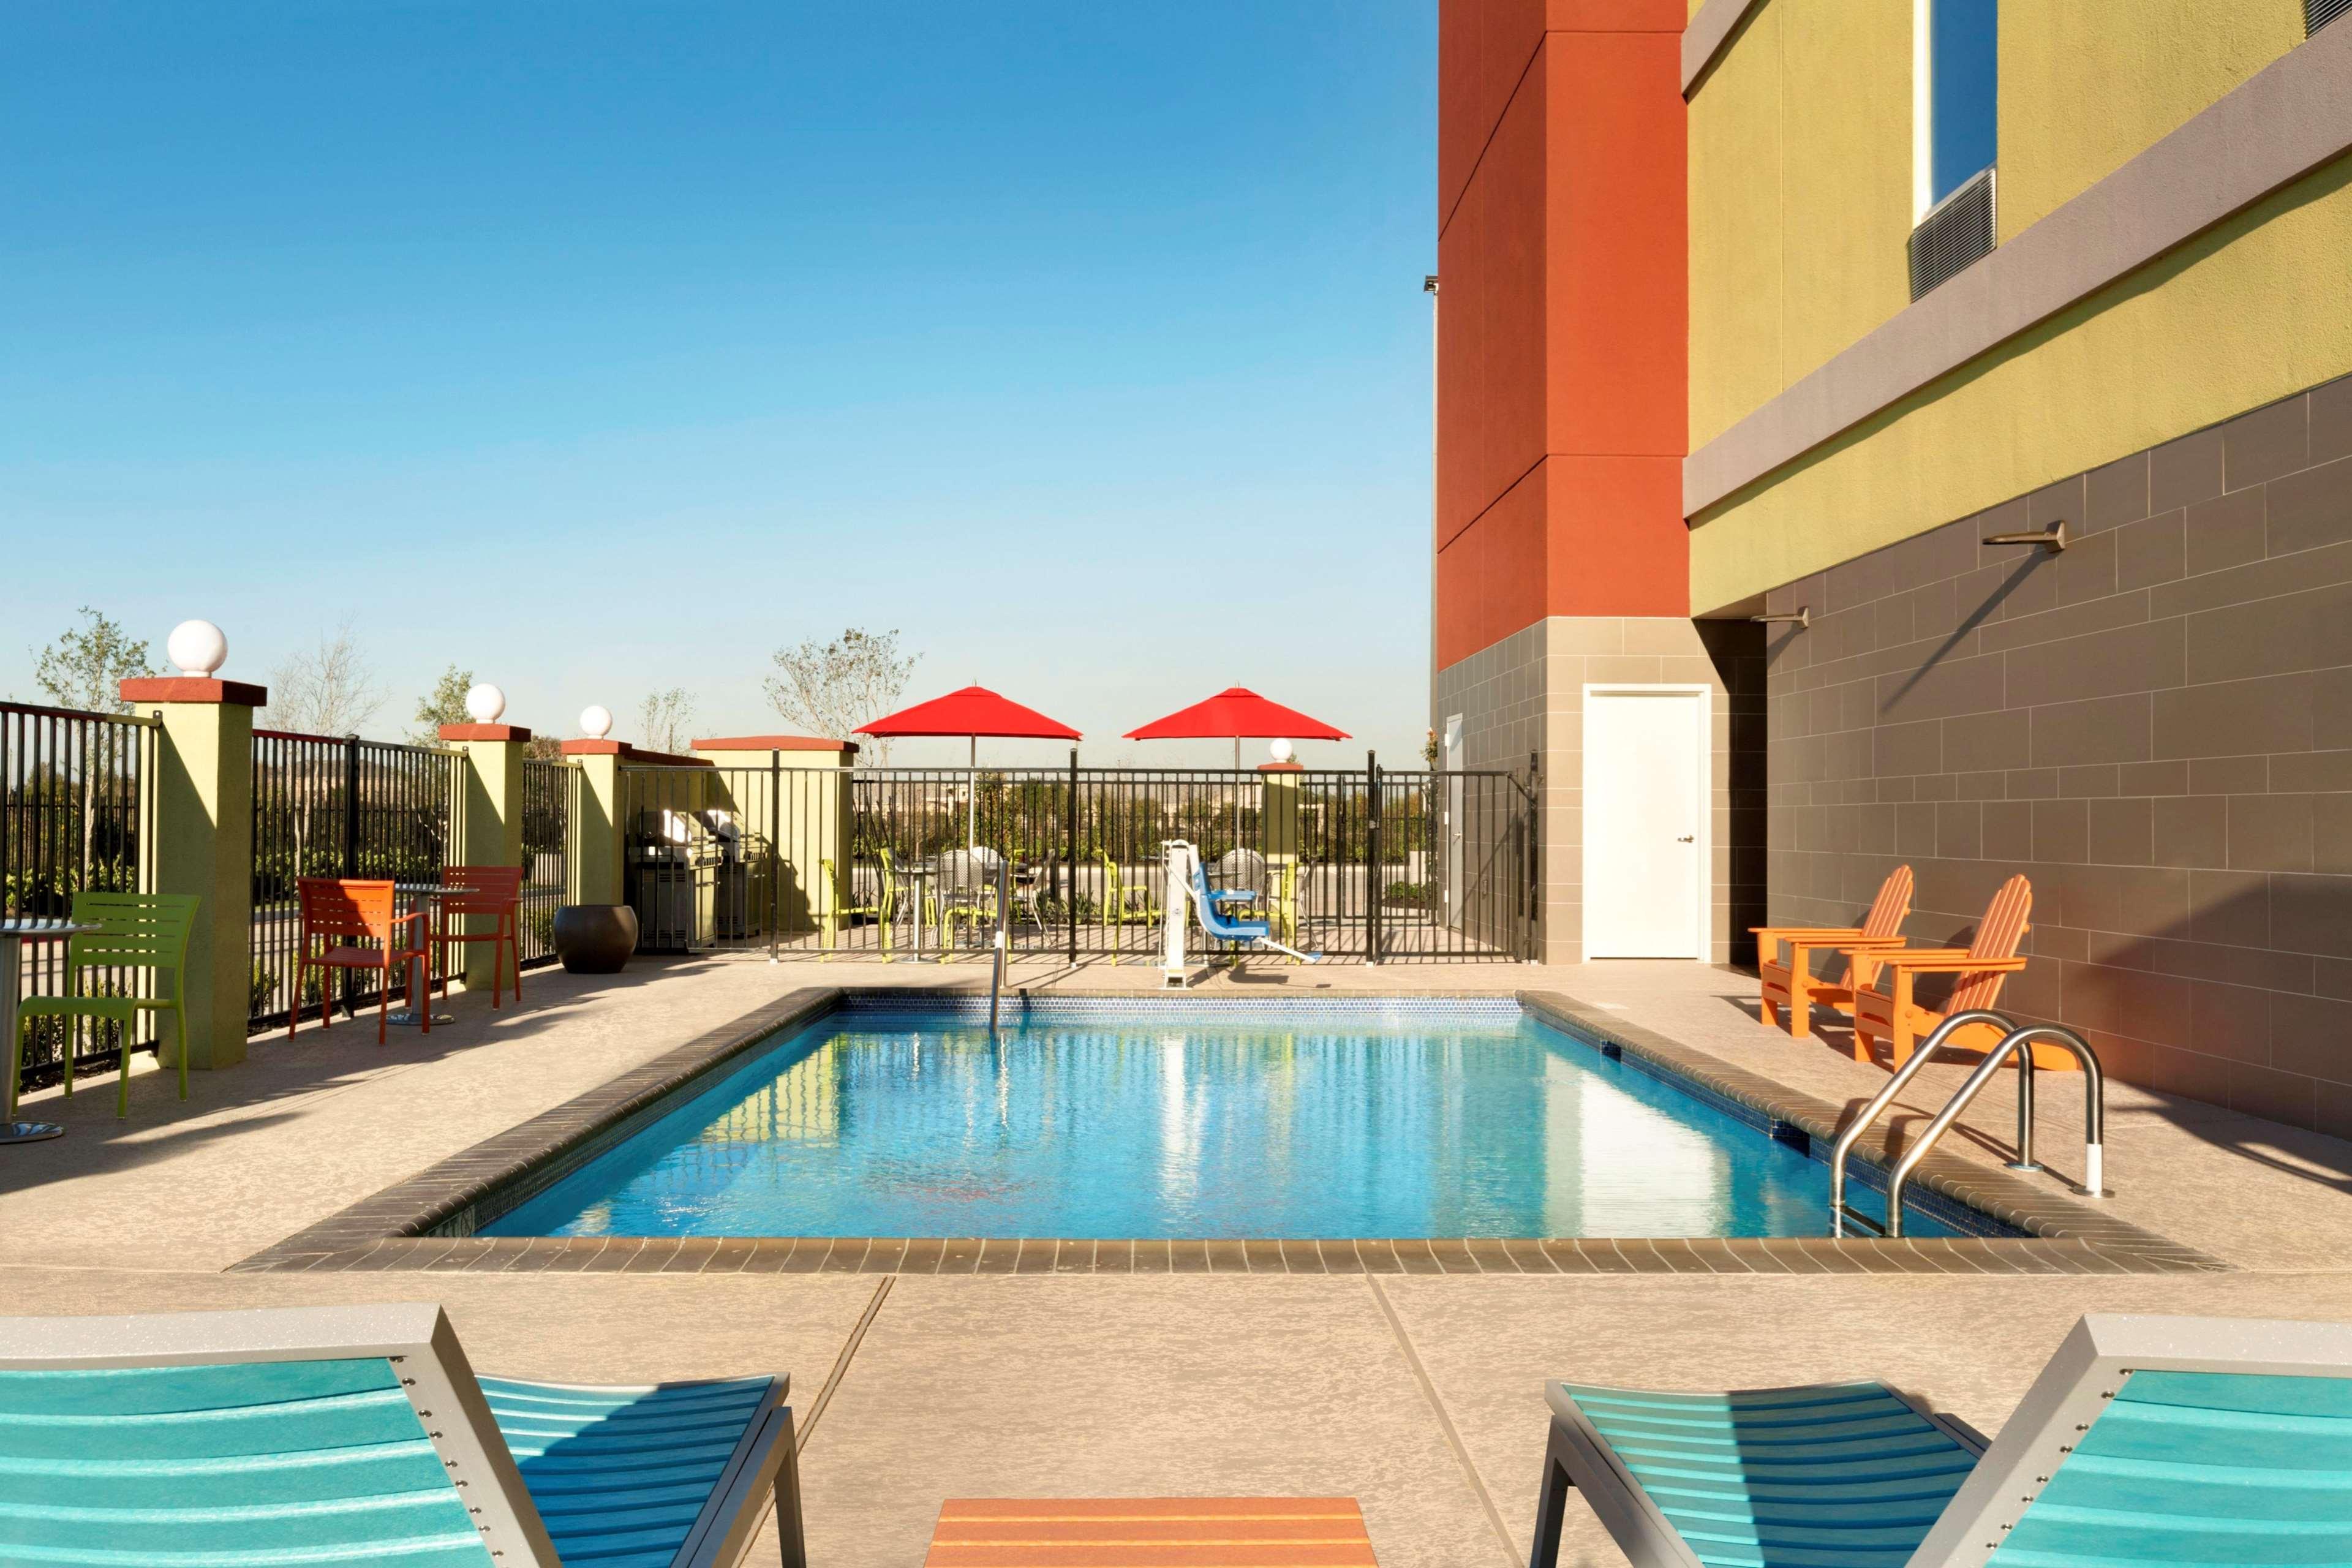 Home2 Suites by Hilton Houston Pasadena image 0